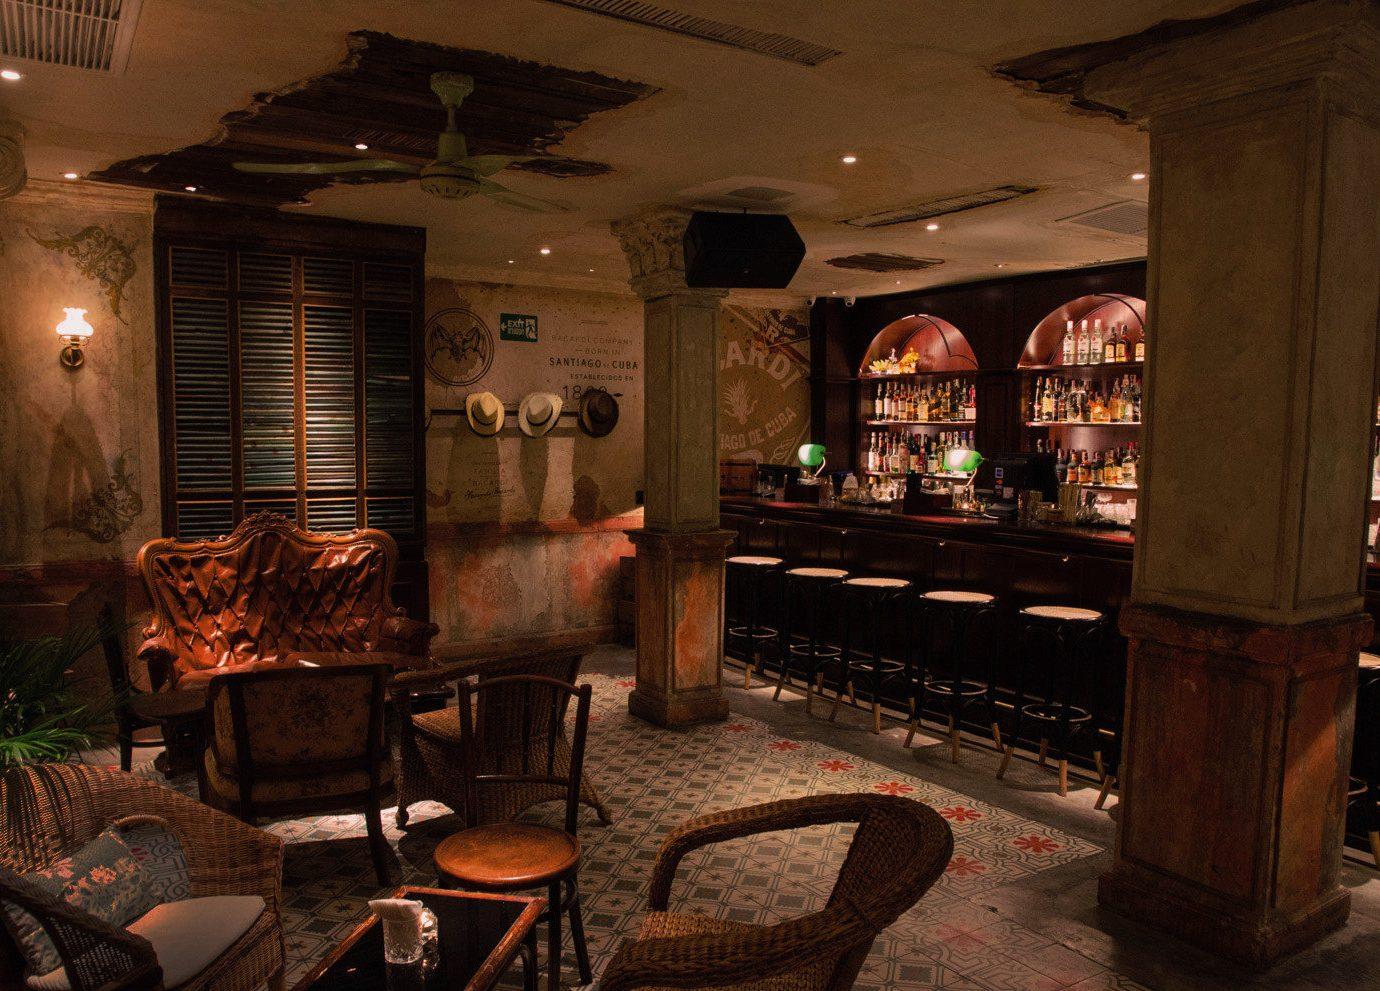 Jetsetter Guides indoor ceiling floor room restaurant Bar estate tavern interior design café furniture